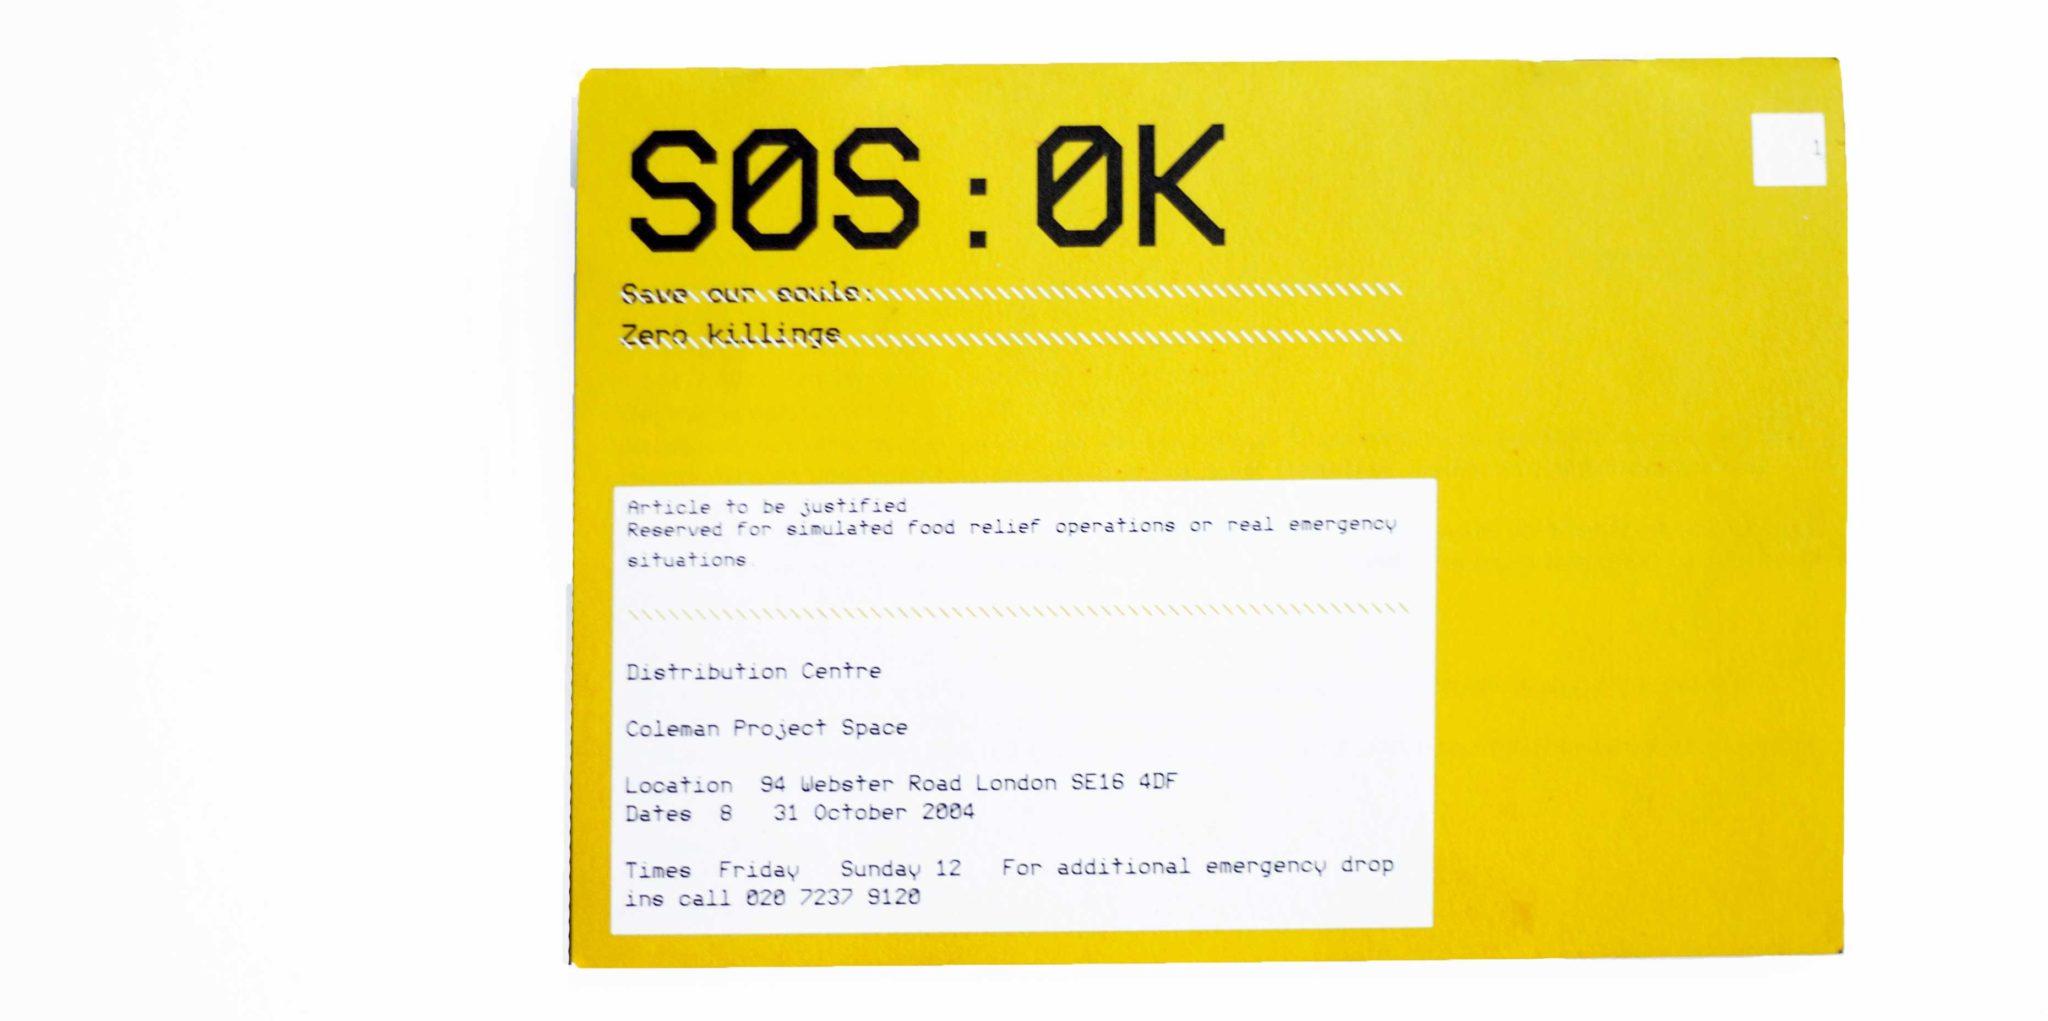 msdm-sosok-emergency-biscuit-kit-13